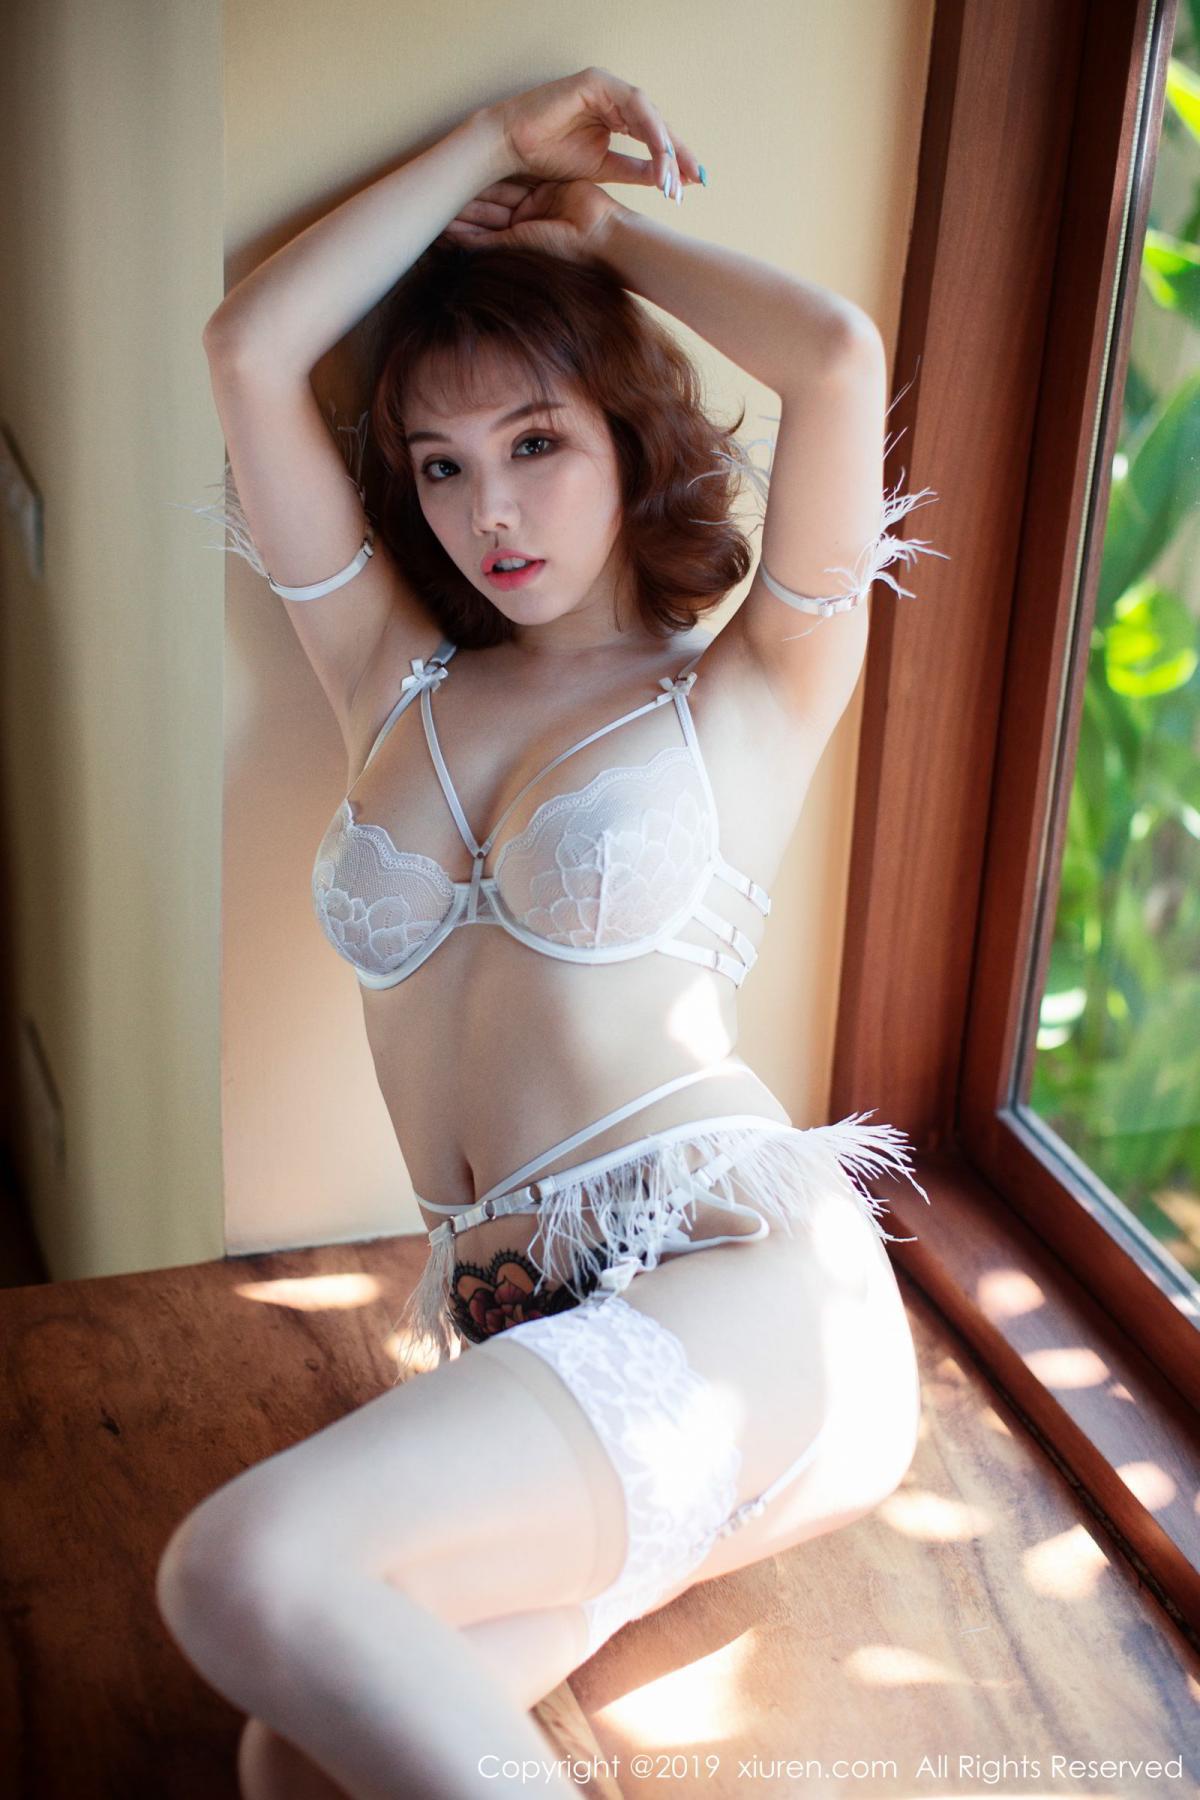 [XiuRen] Vol.1562 Huang Le Ran 19P, Huang Le Ran, Underwear, Xiuren